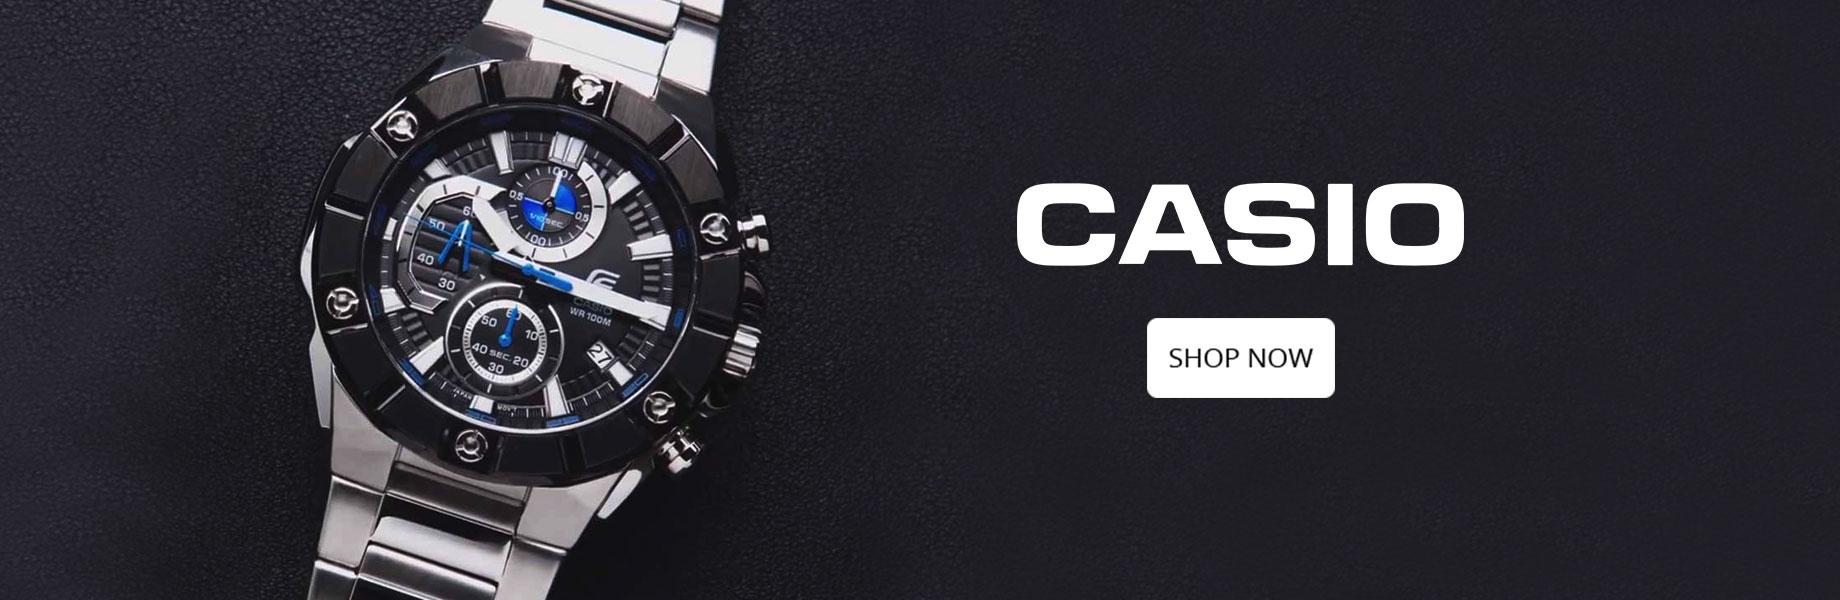 CASIO--WEB.jpg